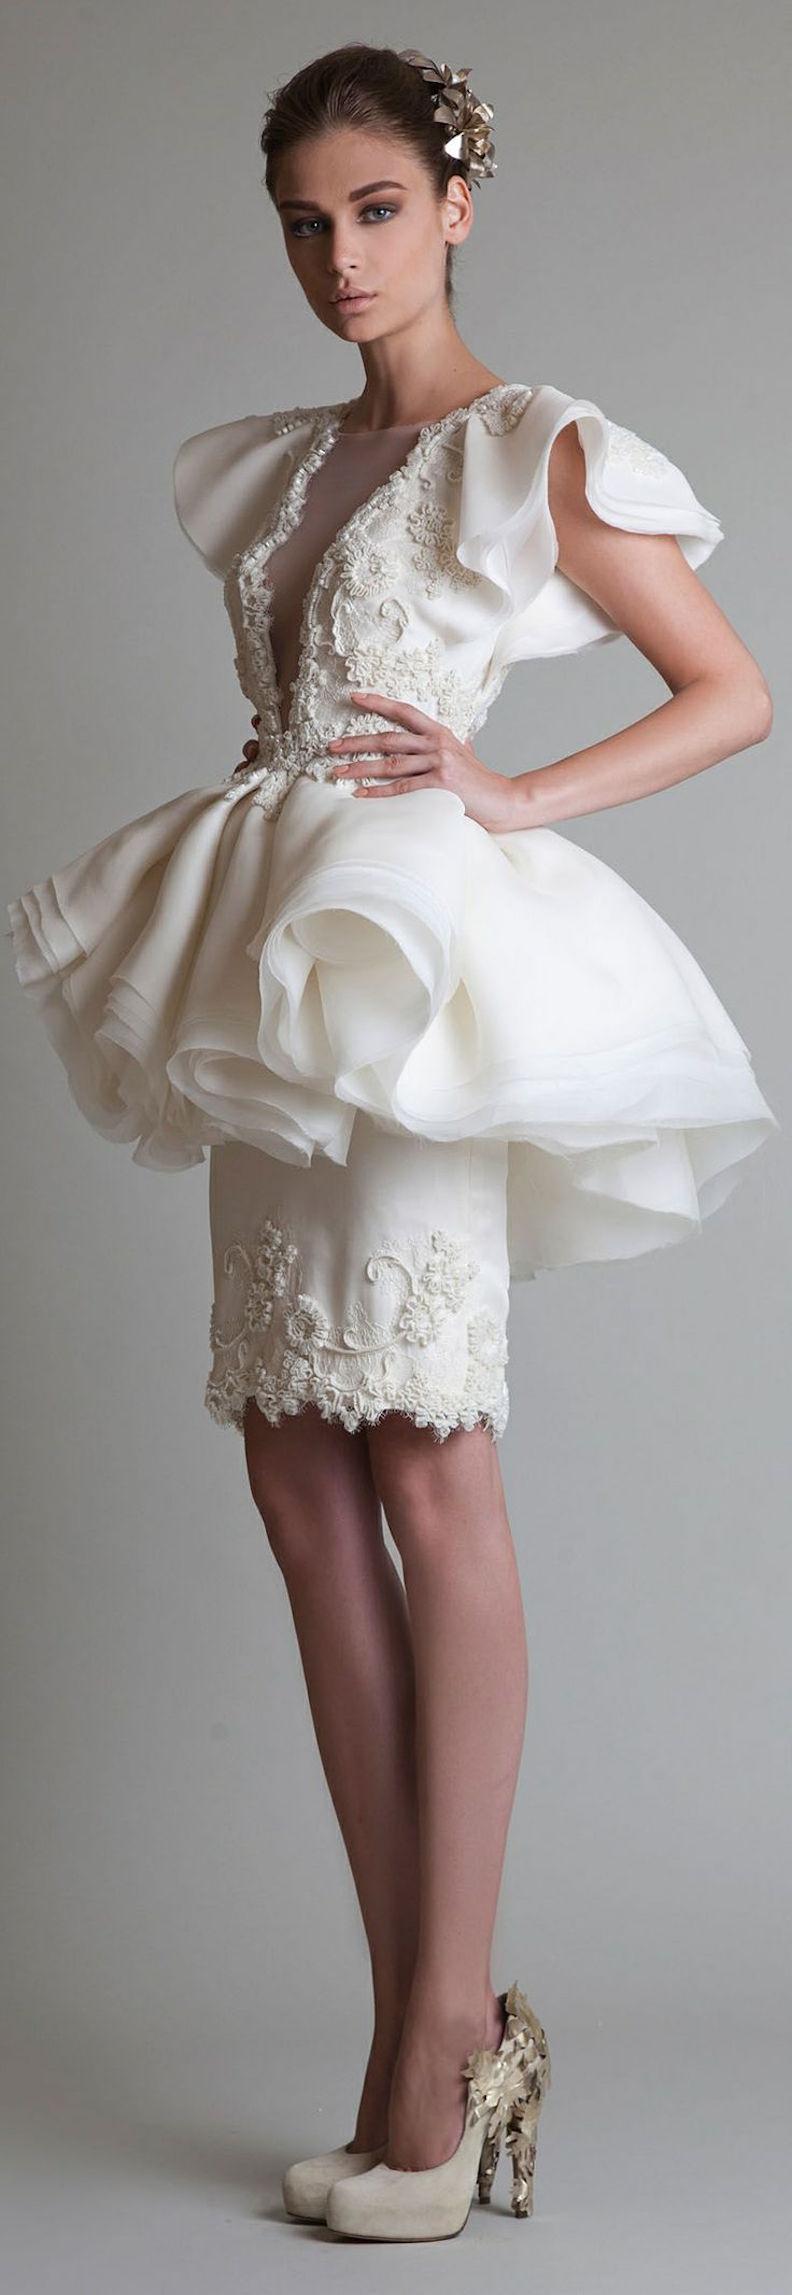 Vestidos De Novias Modernos Archives Mujer Chic